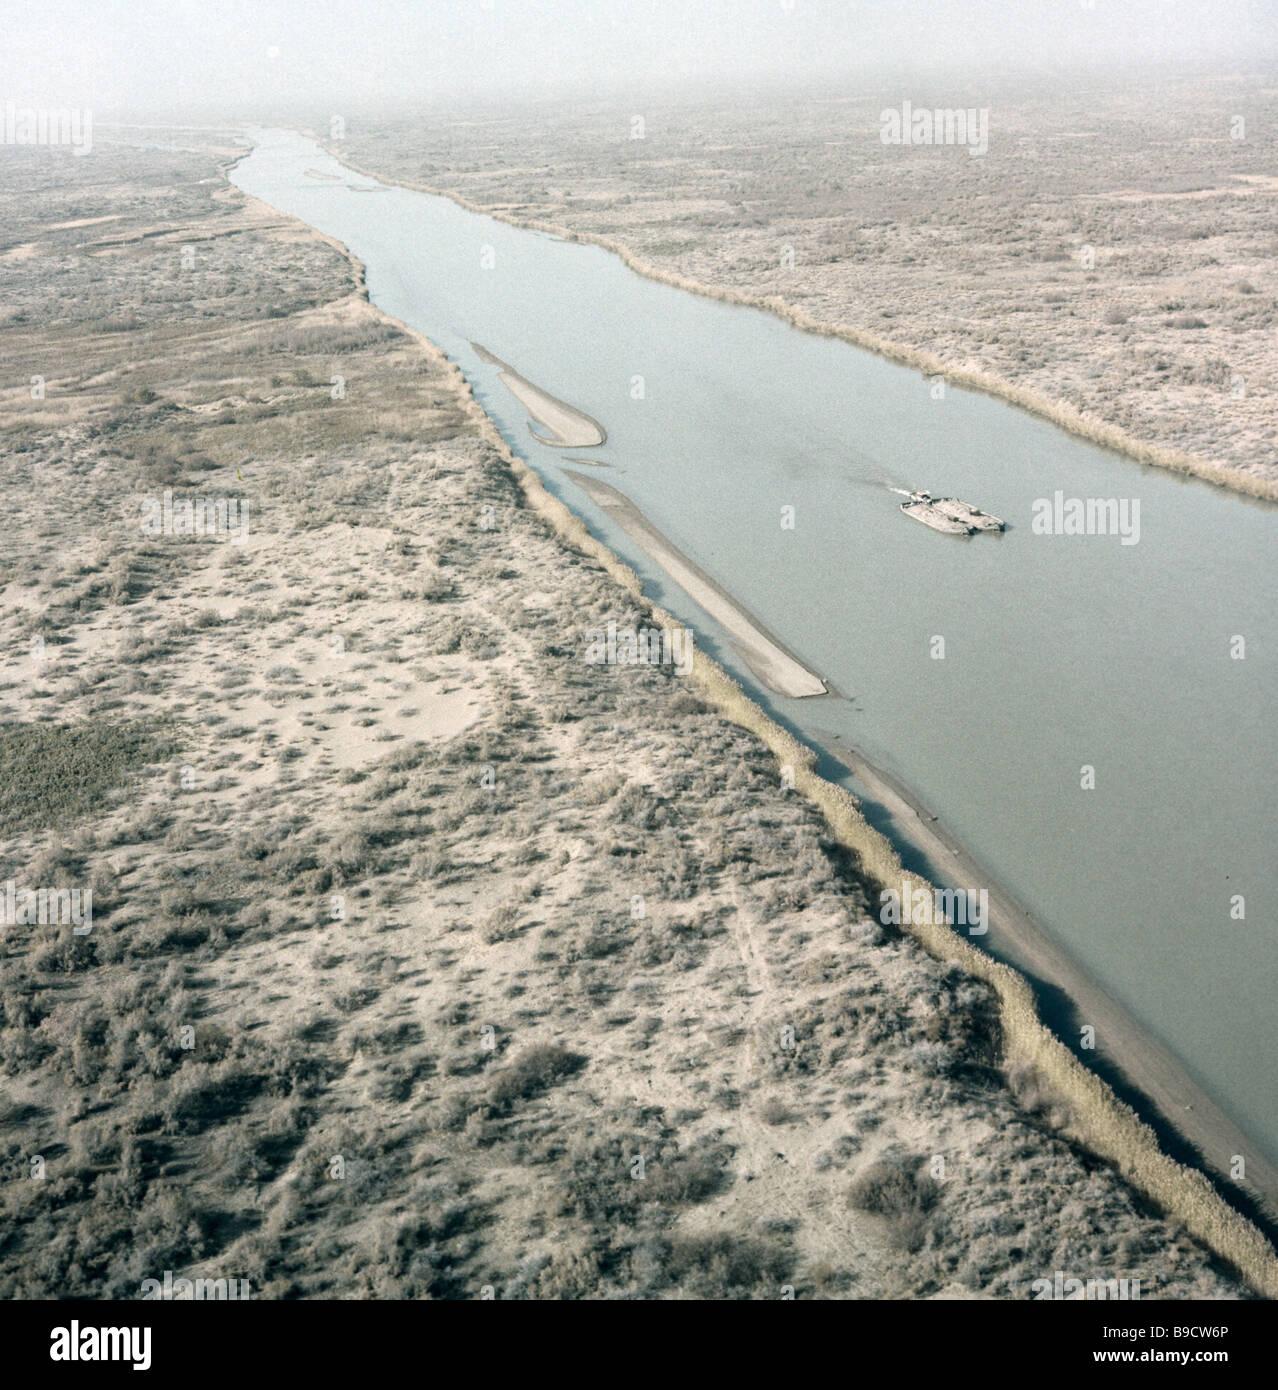 Karakum Kanal